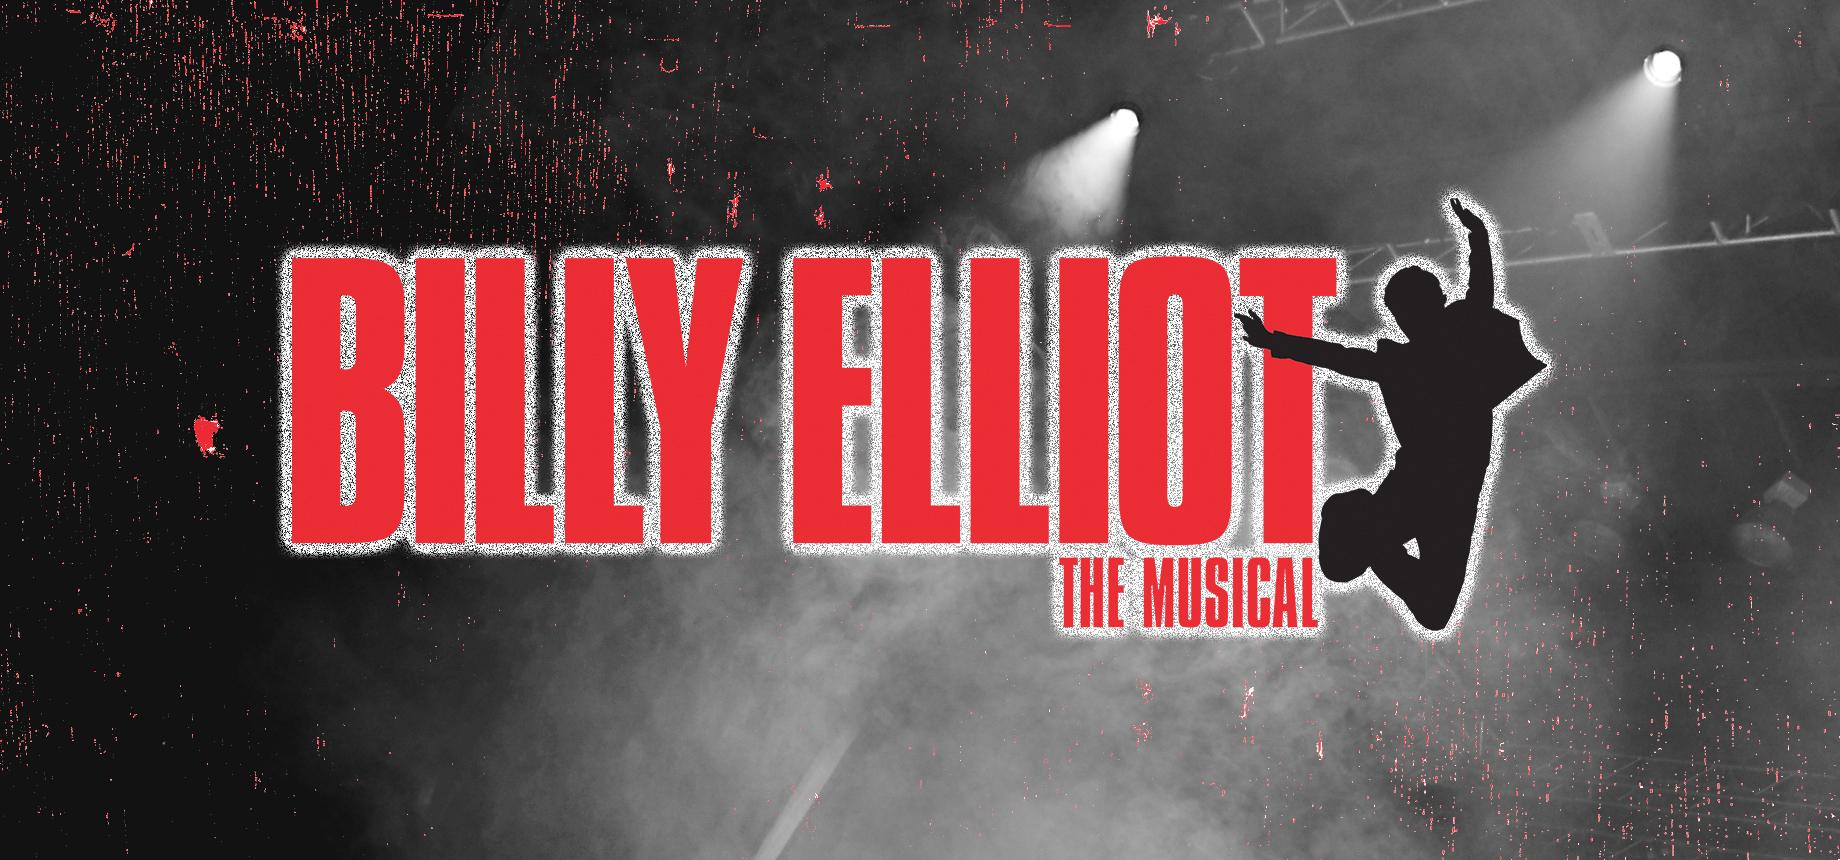 Billy Elliot The Musical Music Theatre International